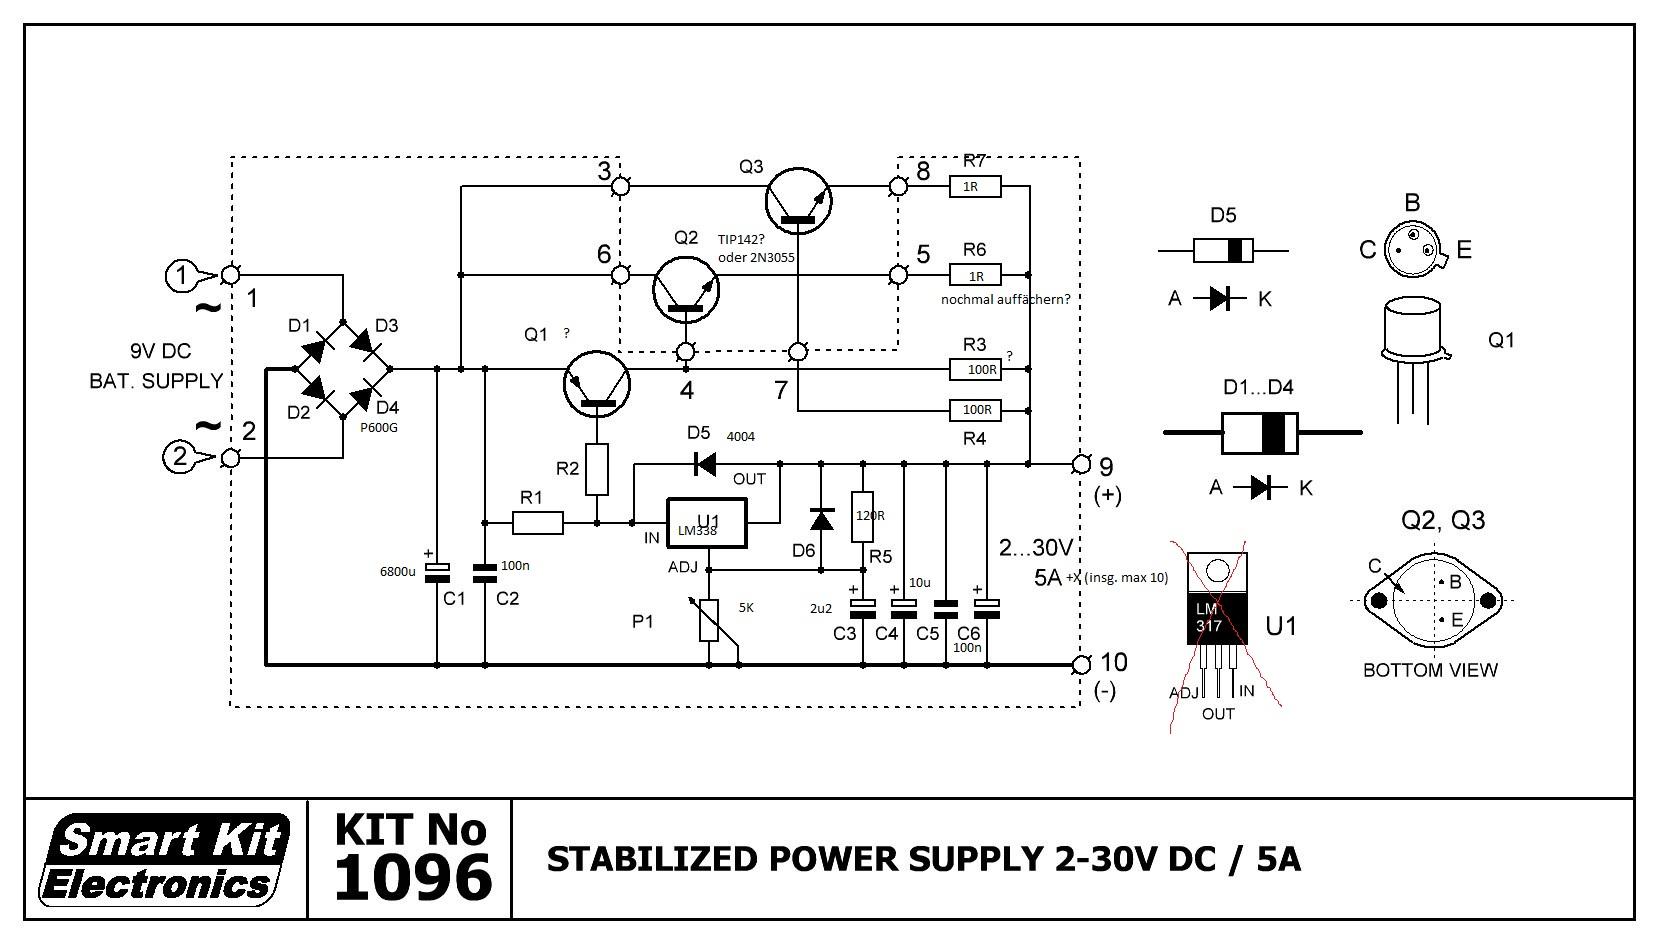 Netzteil-Rätsel konstruktiv - Mikrocontroller.net